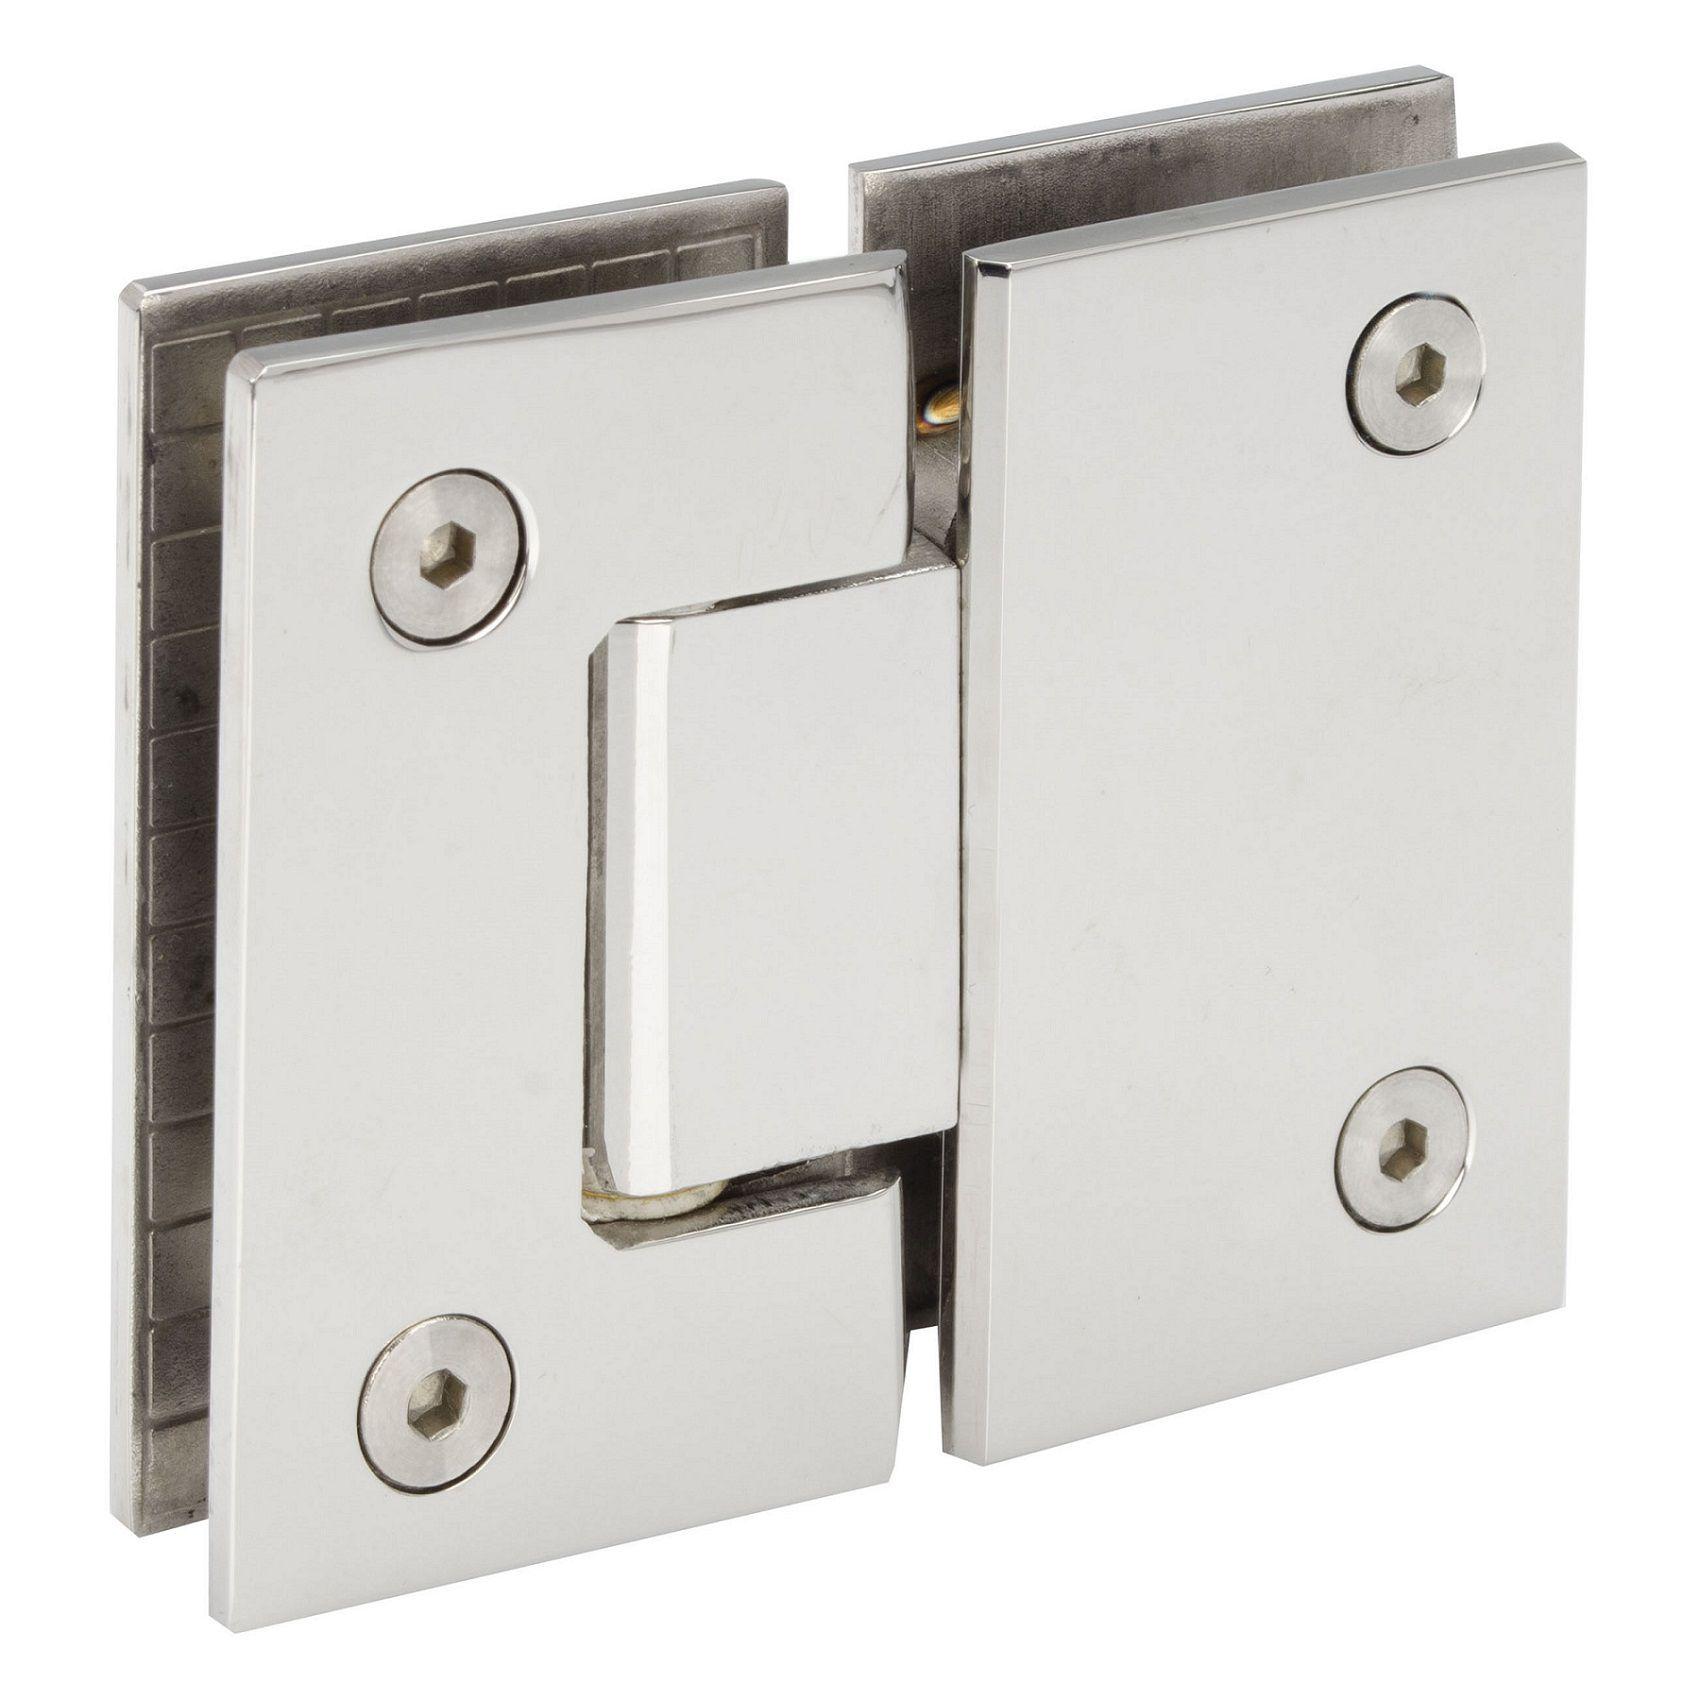 Dobradiça inox GV48 180°1010 para porta de vidro e box - vidro/vidro 2un